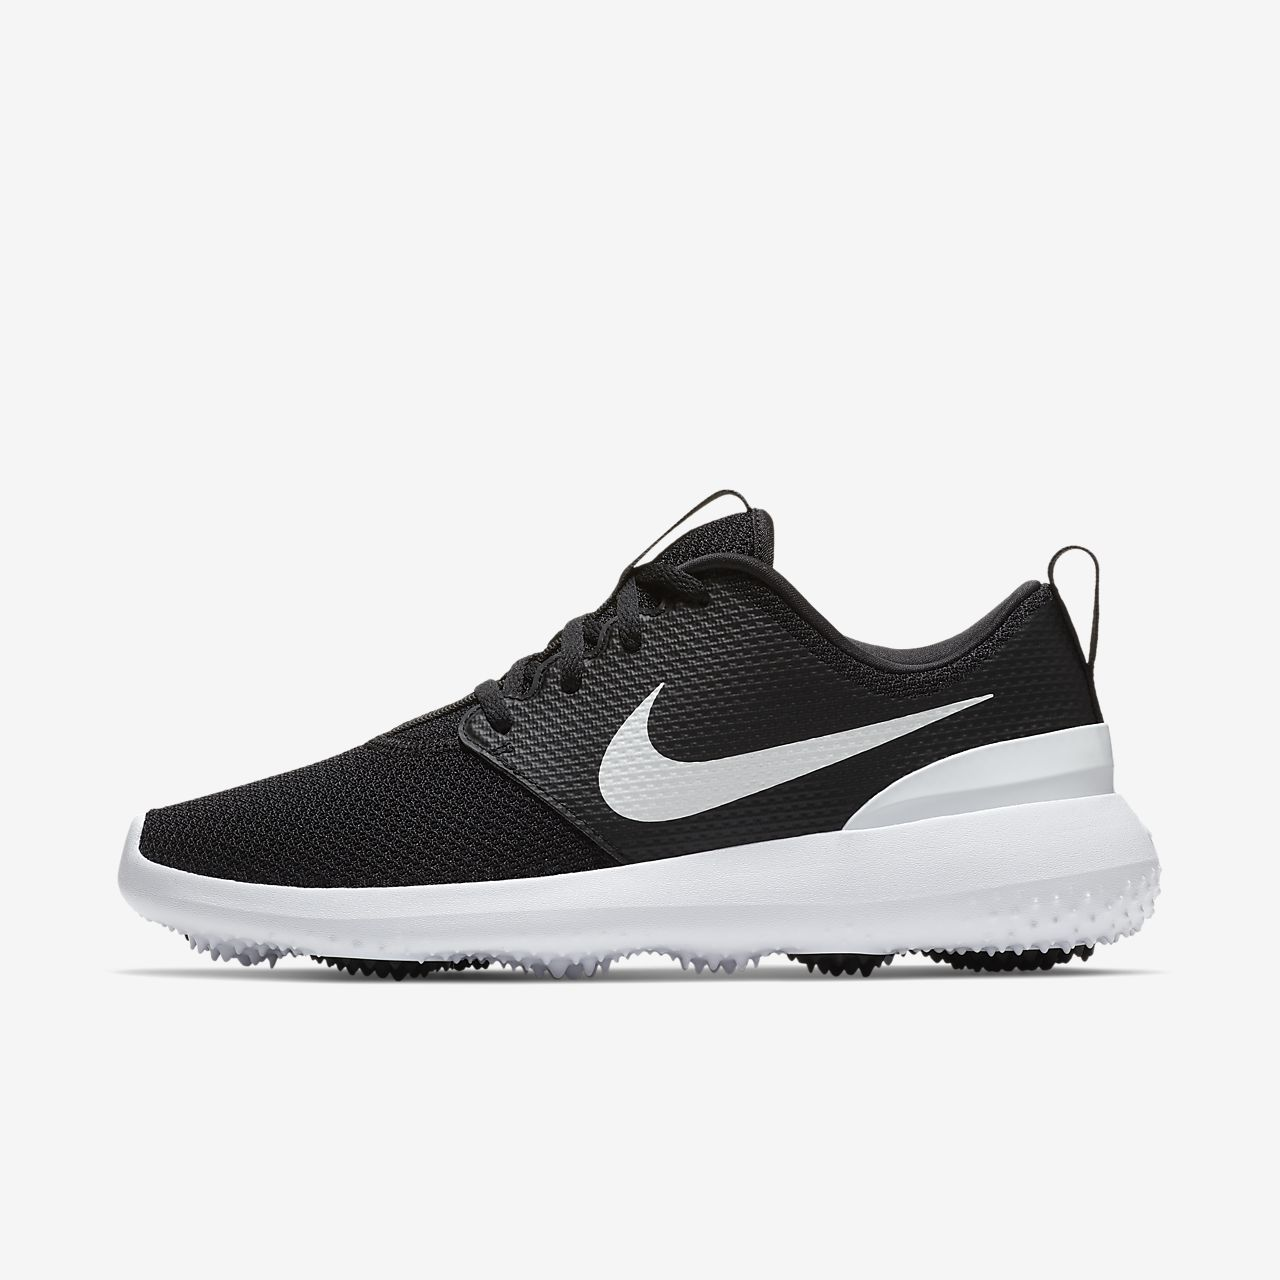 Dámská golfová bota Nike Roshe G